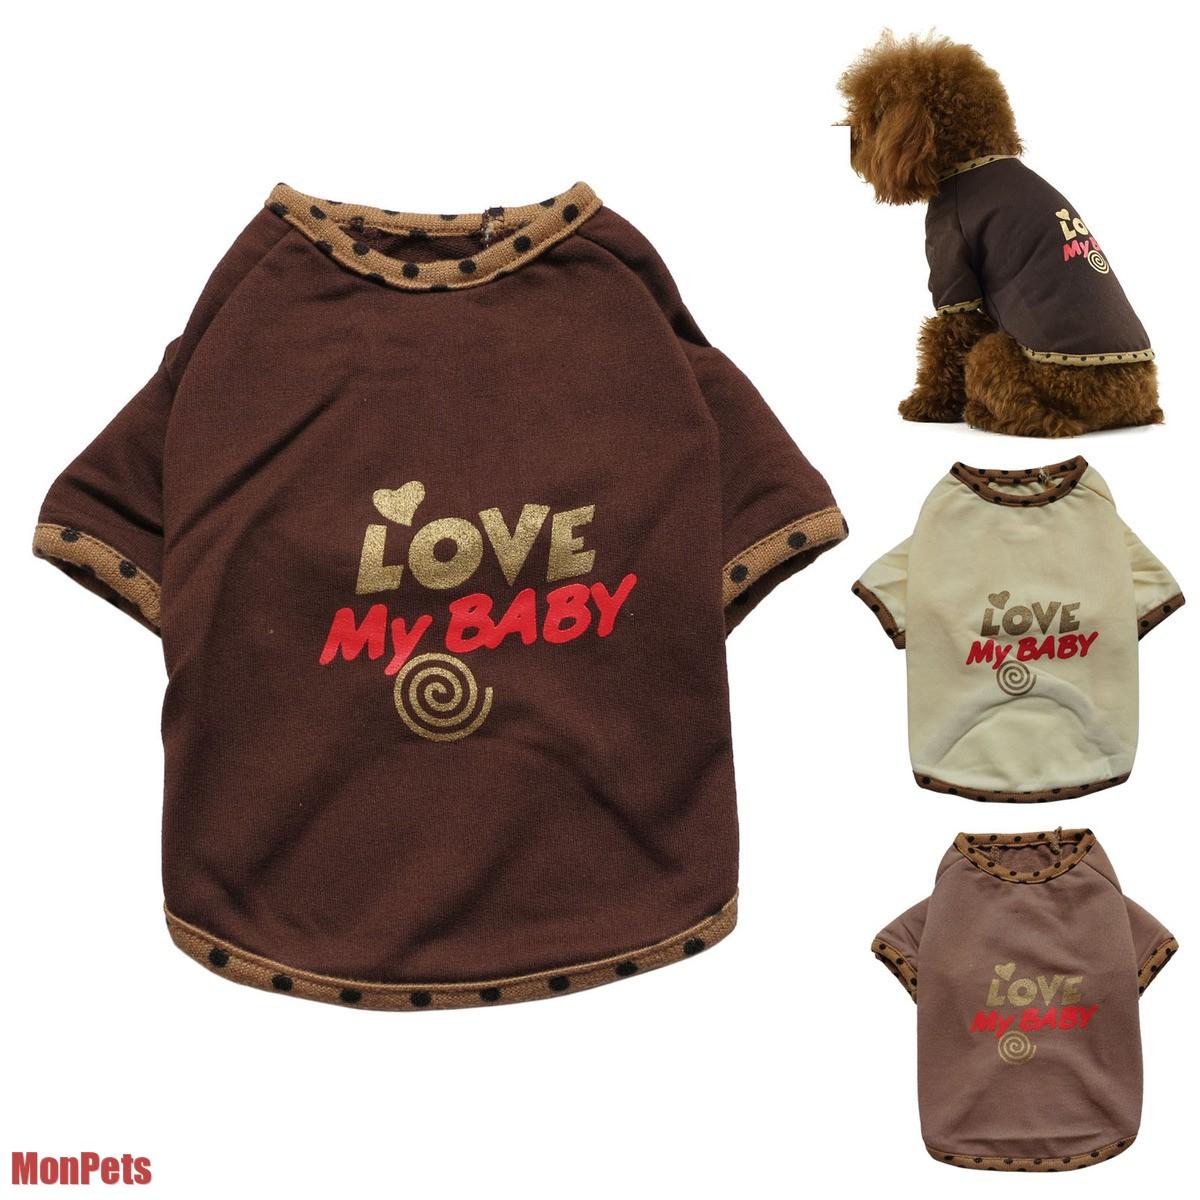 Love My Baby Cute Dog T Shirt Tee Shirt Pet Apparel Dog Clothes XS s M L XL XXL